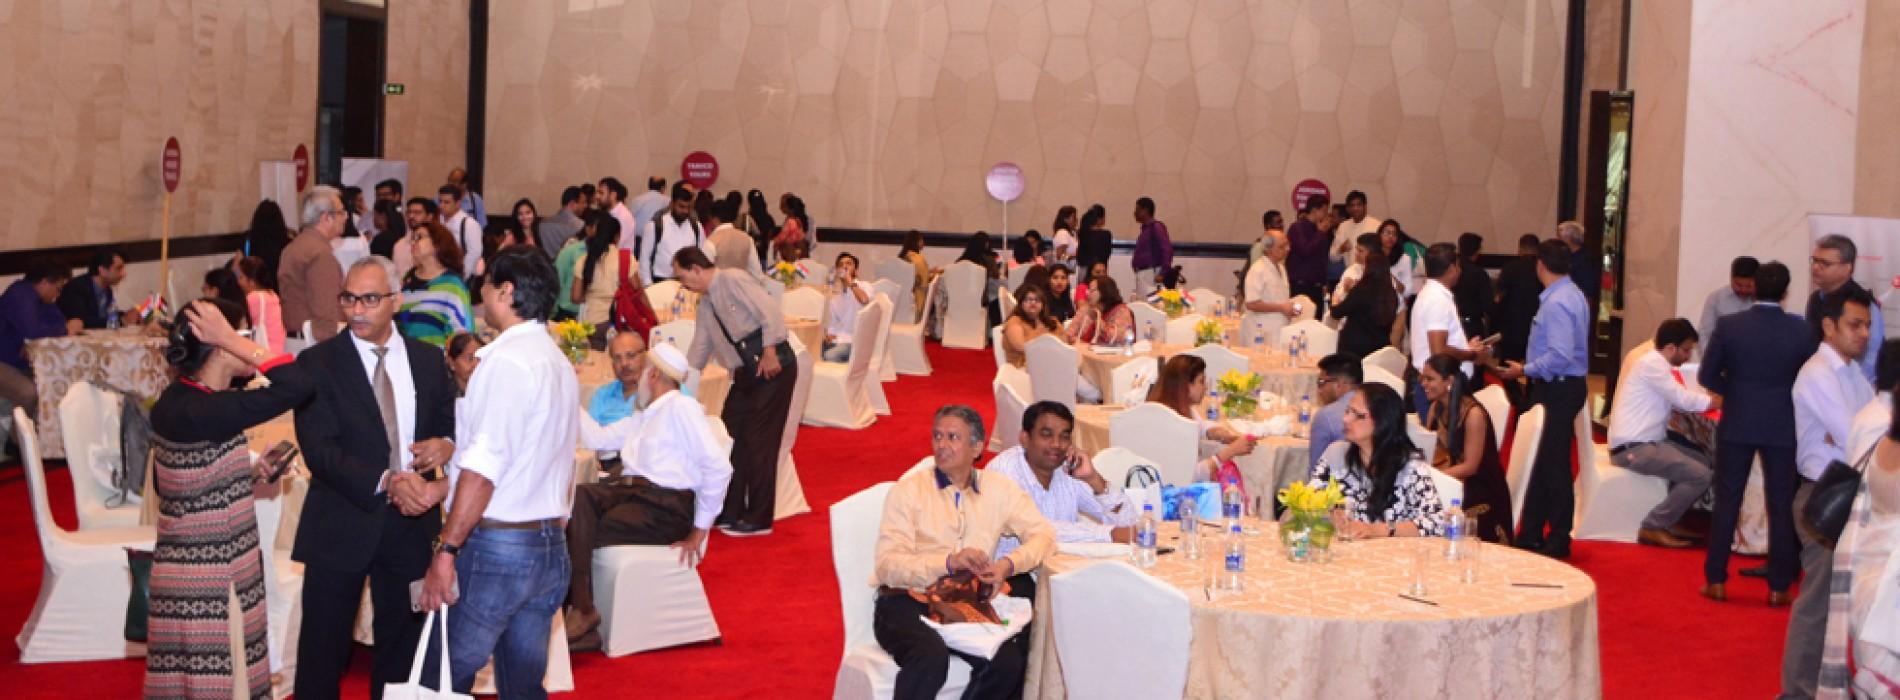 Jordan Tourism Board conducts B2B Roadshow in Mumbai